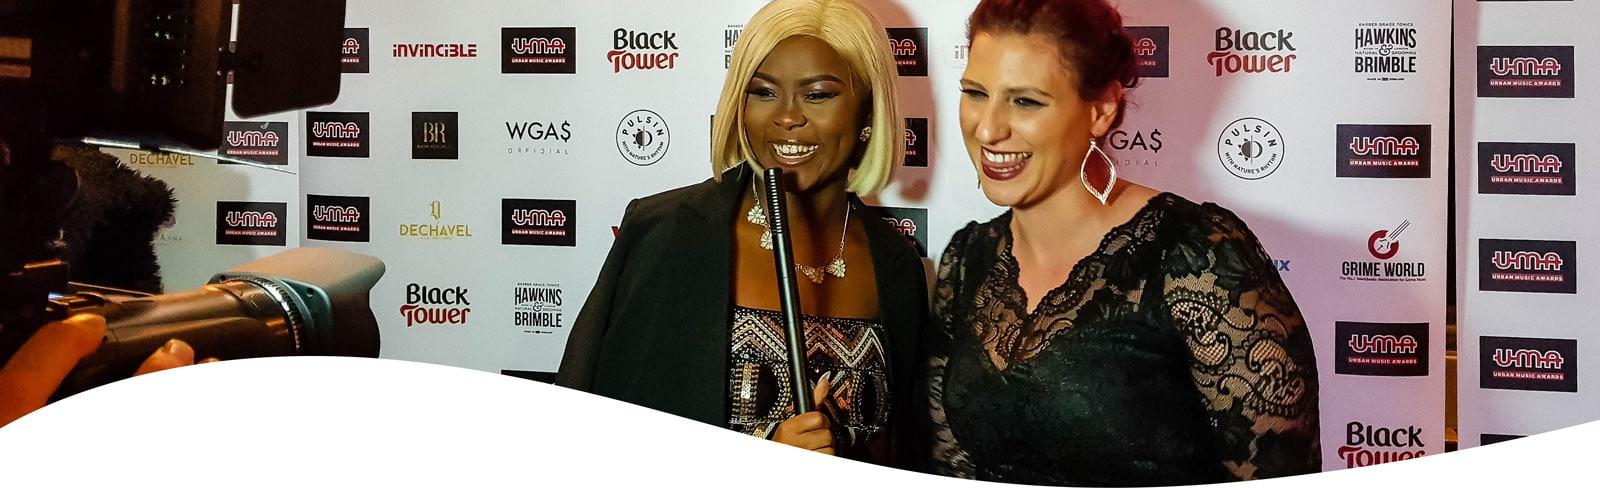 Despina, Uk artist, urban music awards, music awards, UMA, London, Brit awards, artist interview